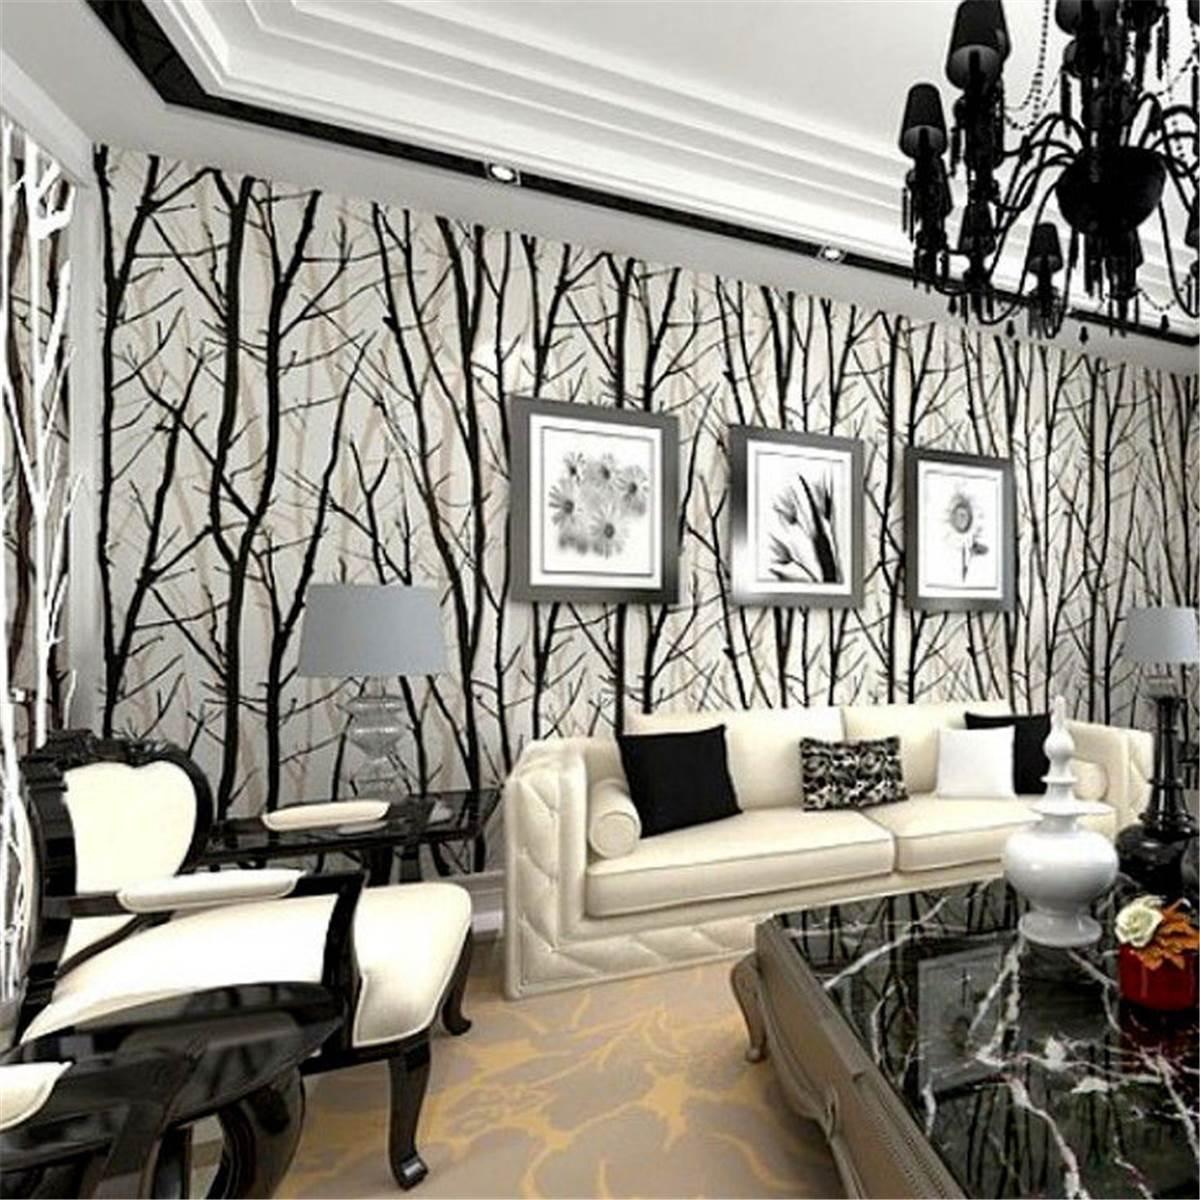 Online kopen Wholesale black and white tree decoration uit China ...